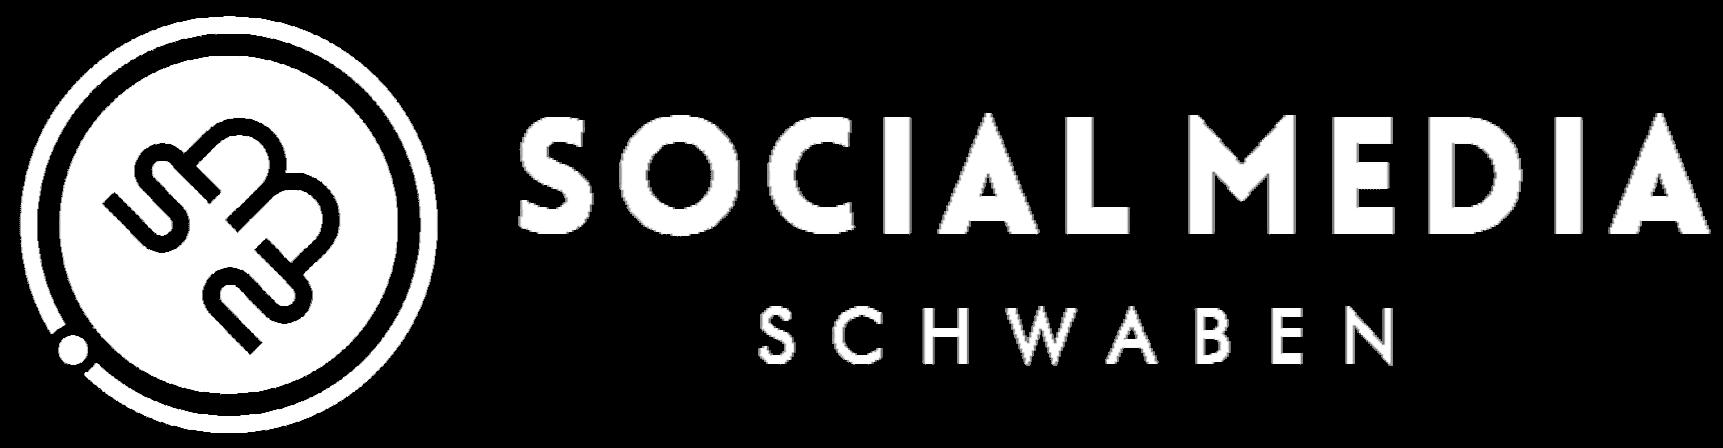 Website-Logo von Social Media Schwaben